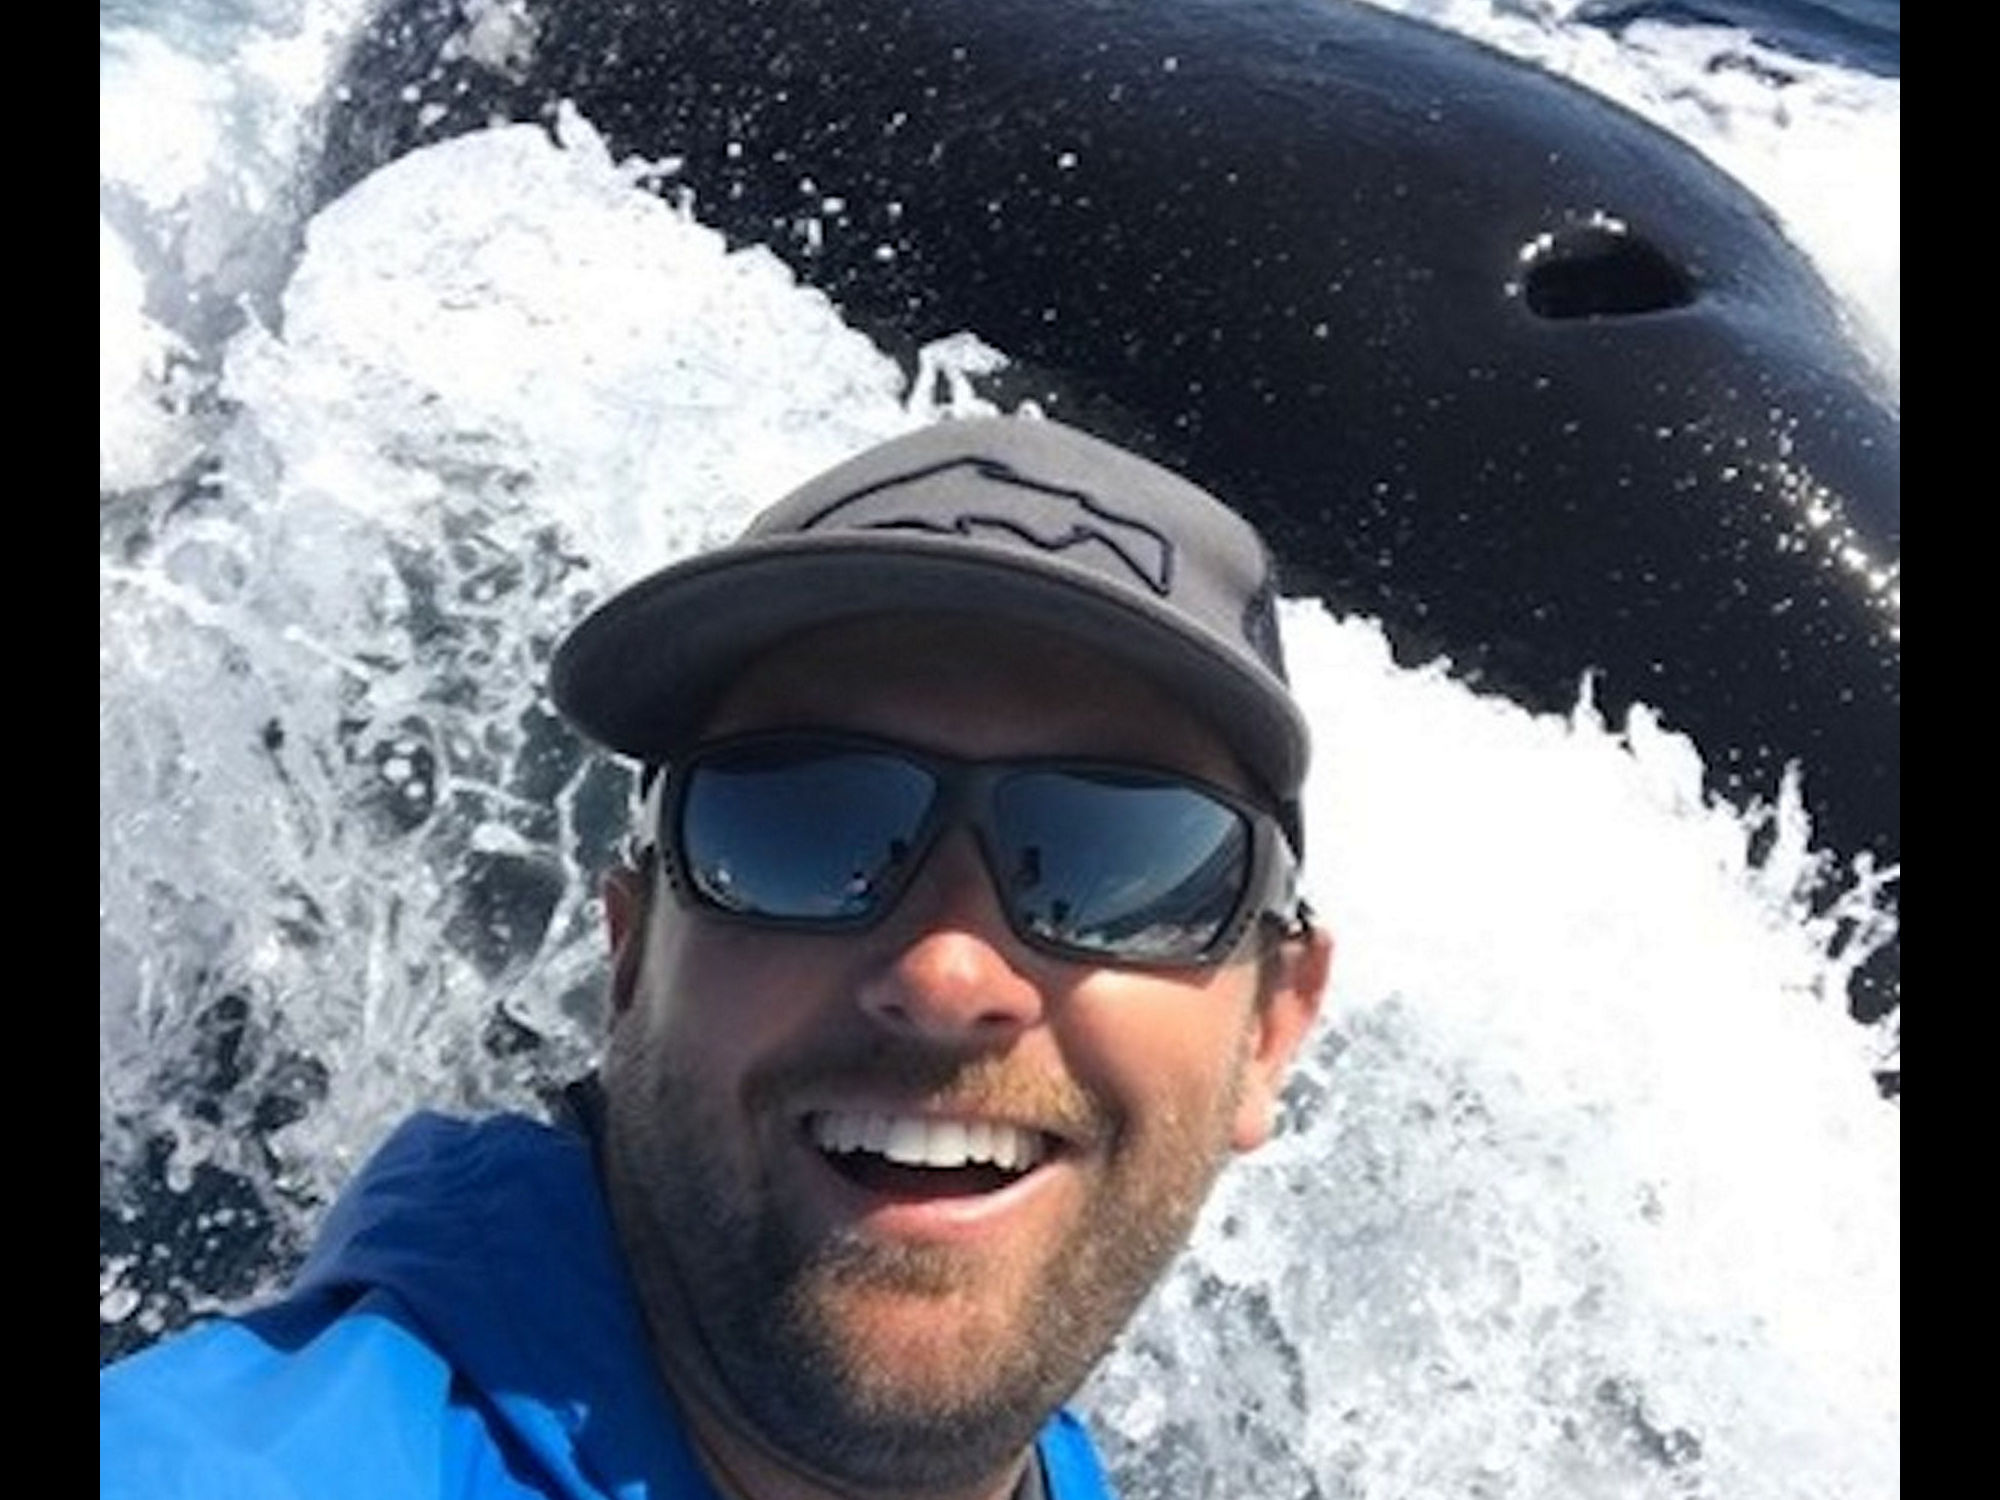 Local Captain Snaps Orca 'Selfie' - Newport Beach News